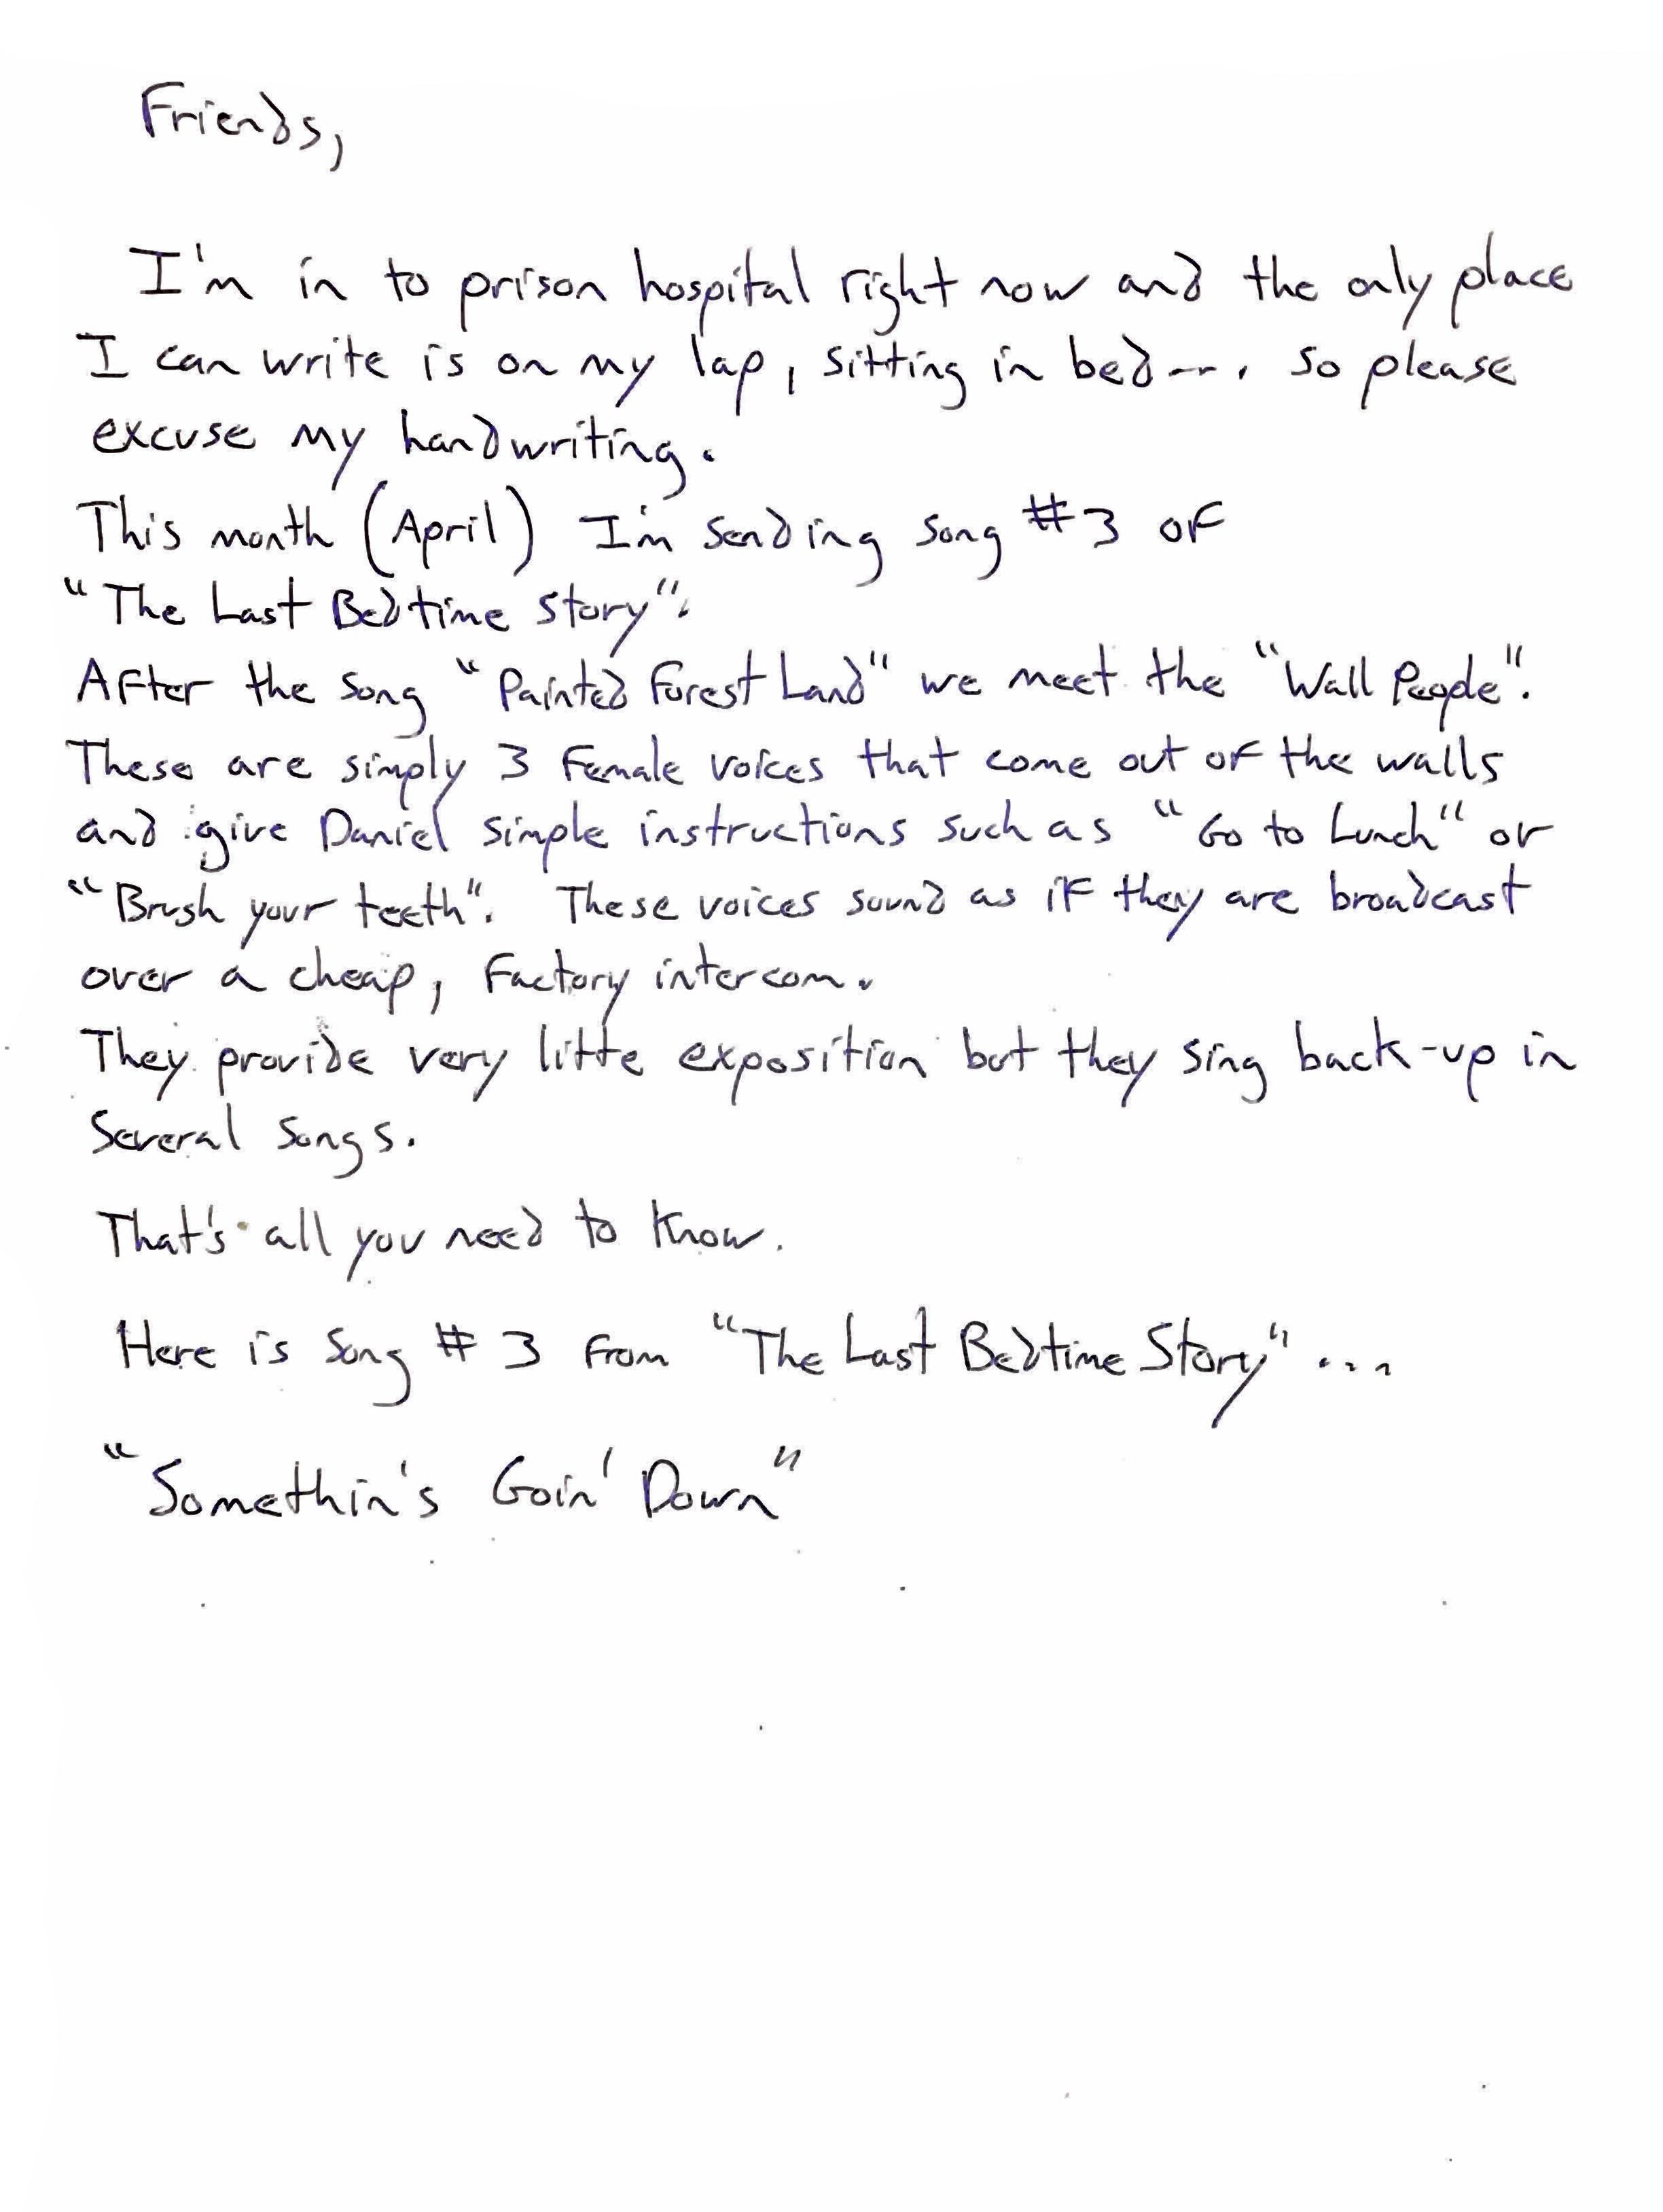 Jimmy's Letter - April 4, 2019